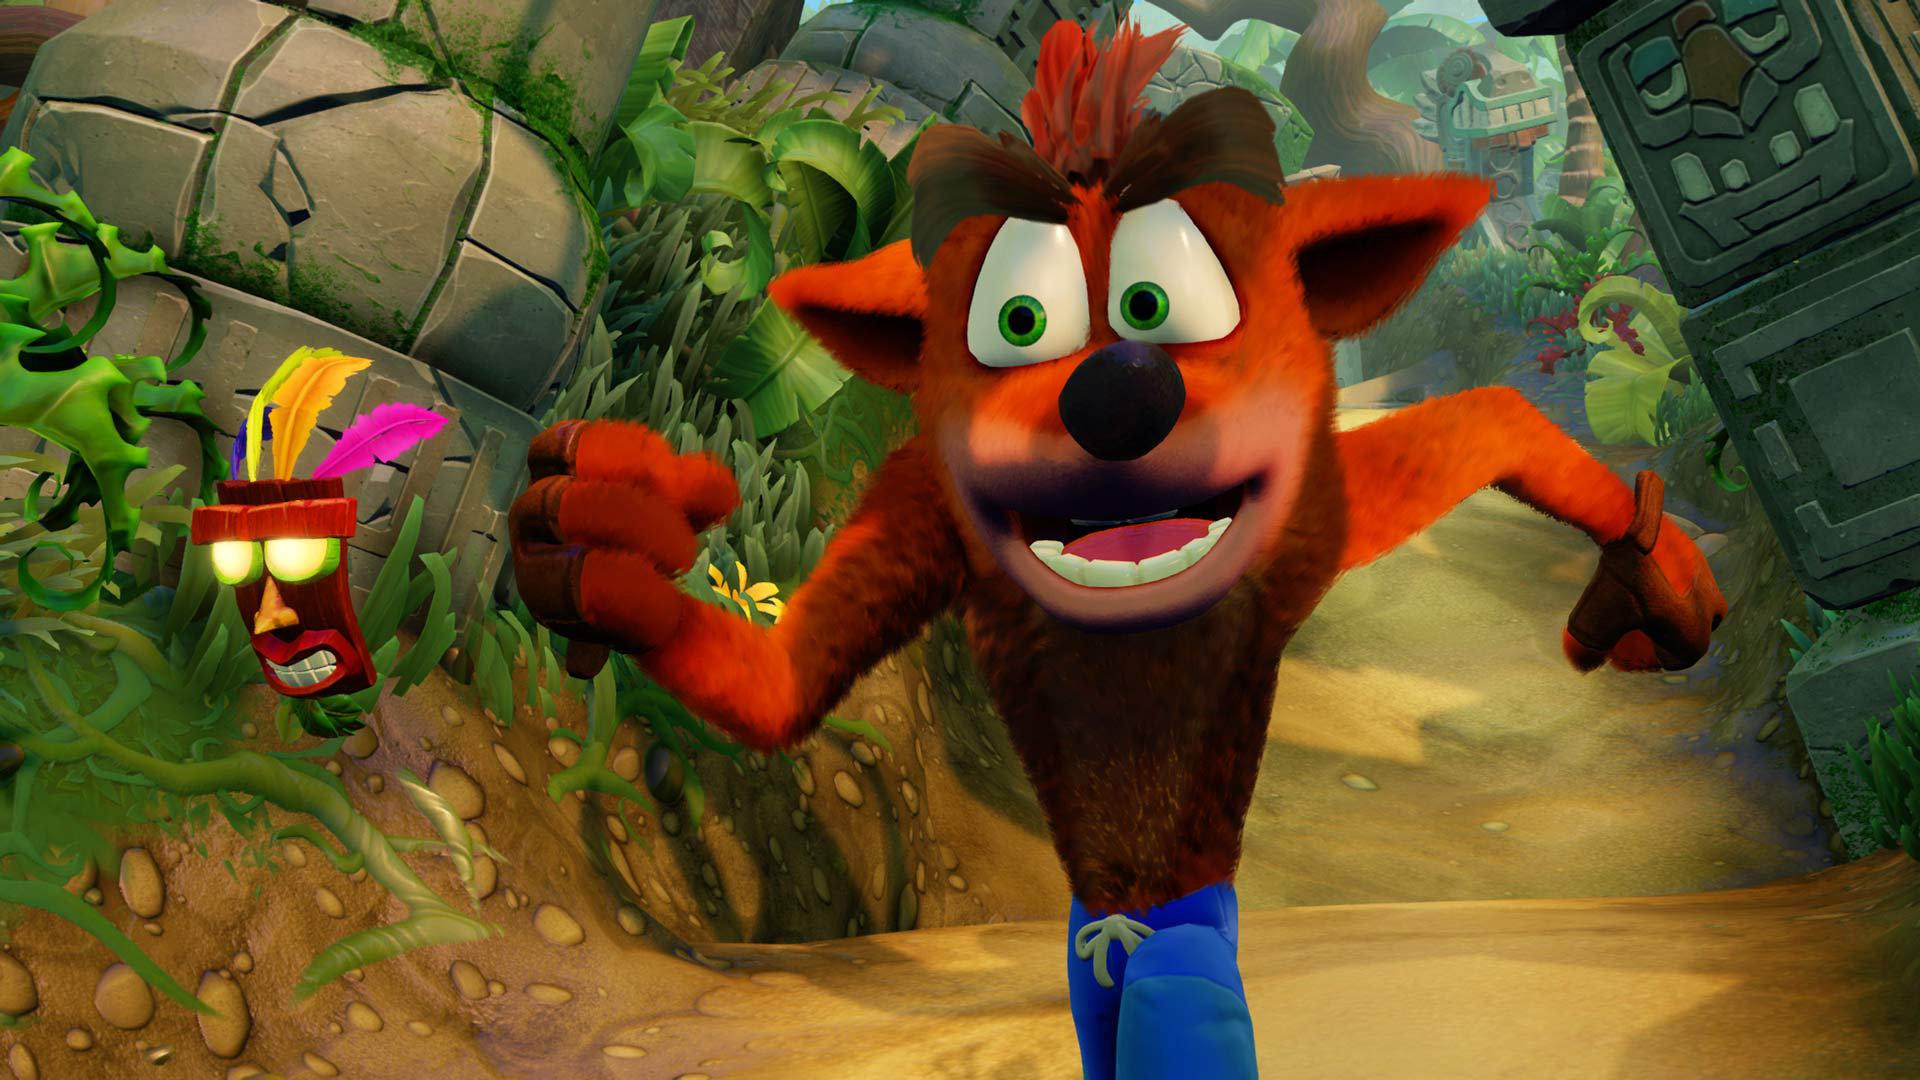 Rumour: Brazilian Website Spills Crash Bandicoot N. Sane Trilogy Release Date